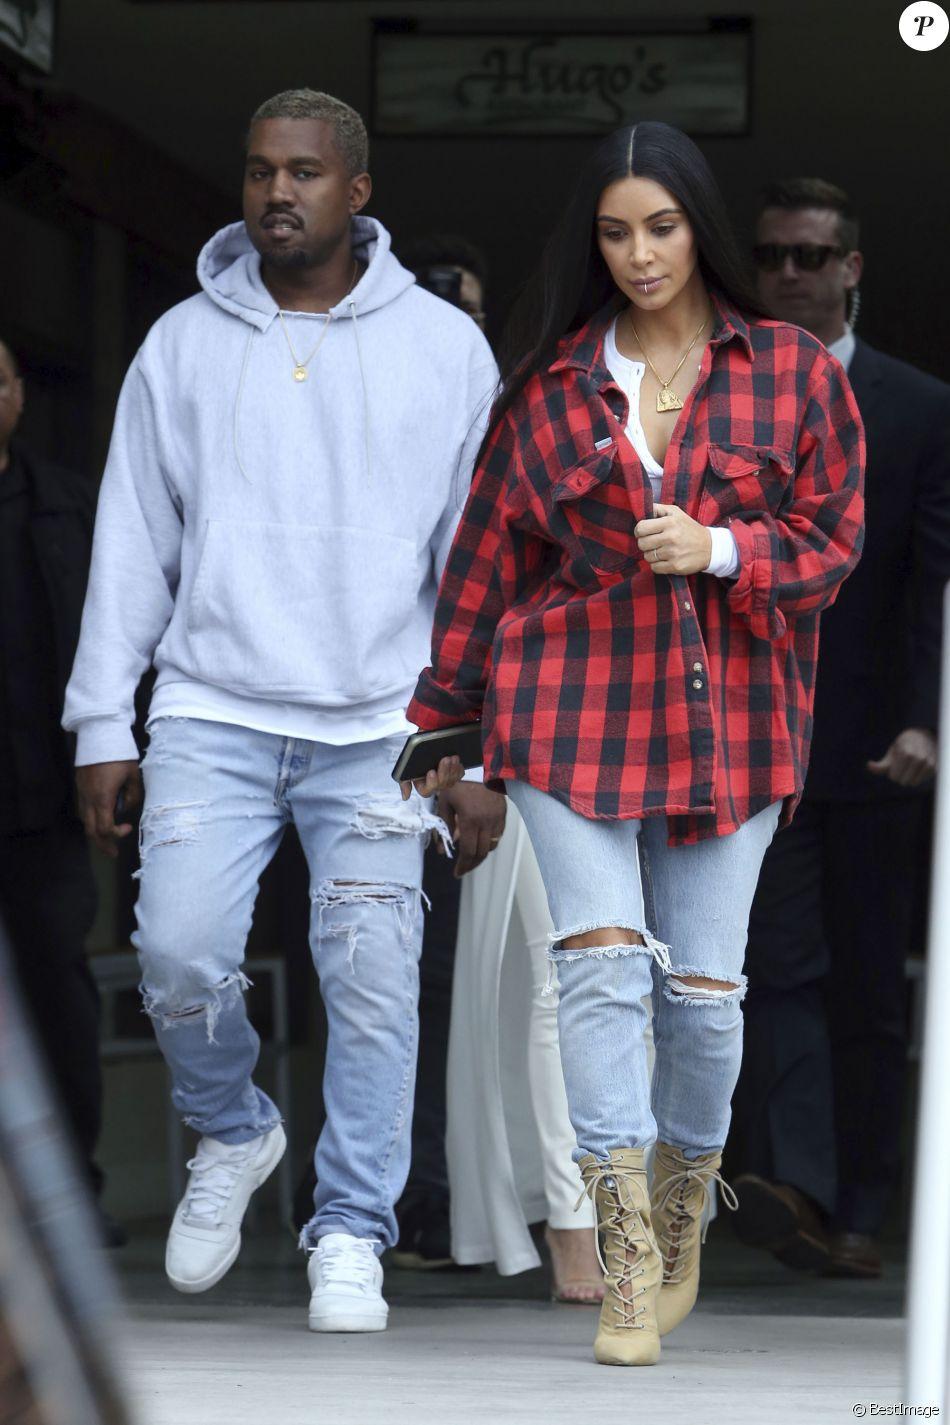 Kim Kardashian et Kanye West retrouvent Kourtney Kardashian pour déjeuner à Calabasas, le 18 janvier 2017.